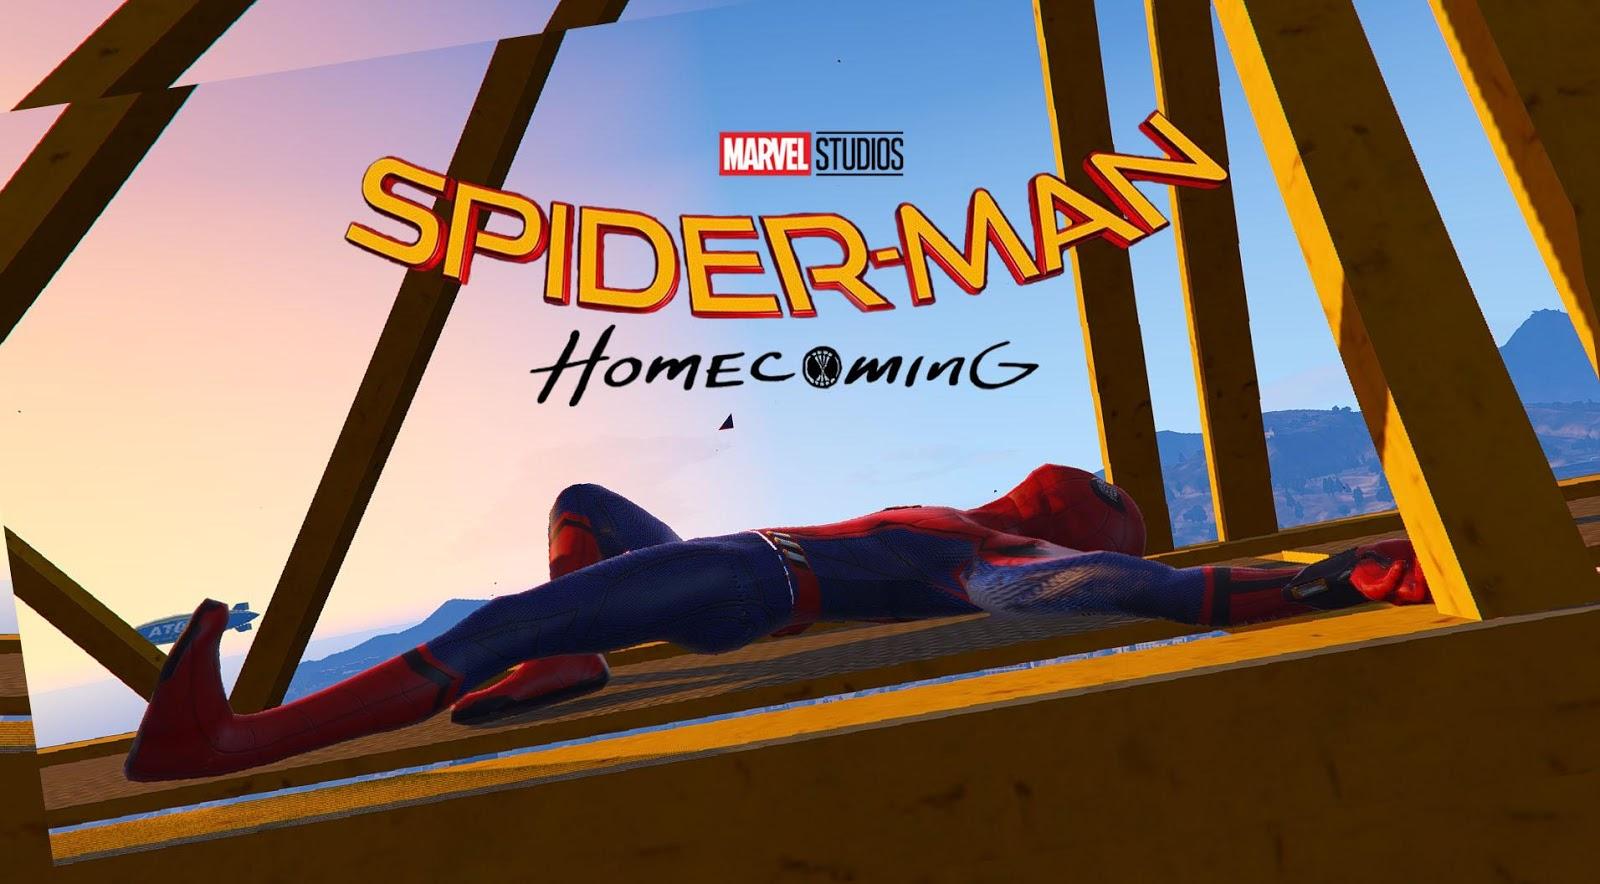 Spider Man Homecoming 3 news